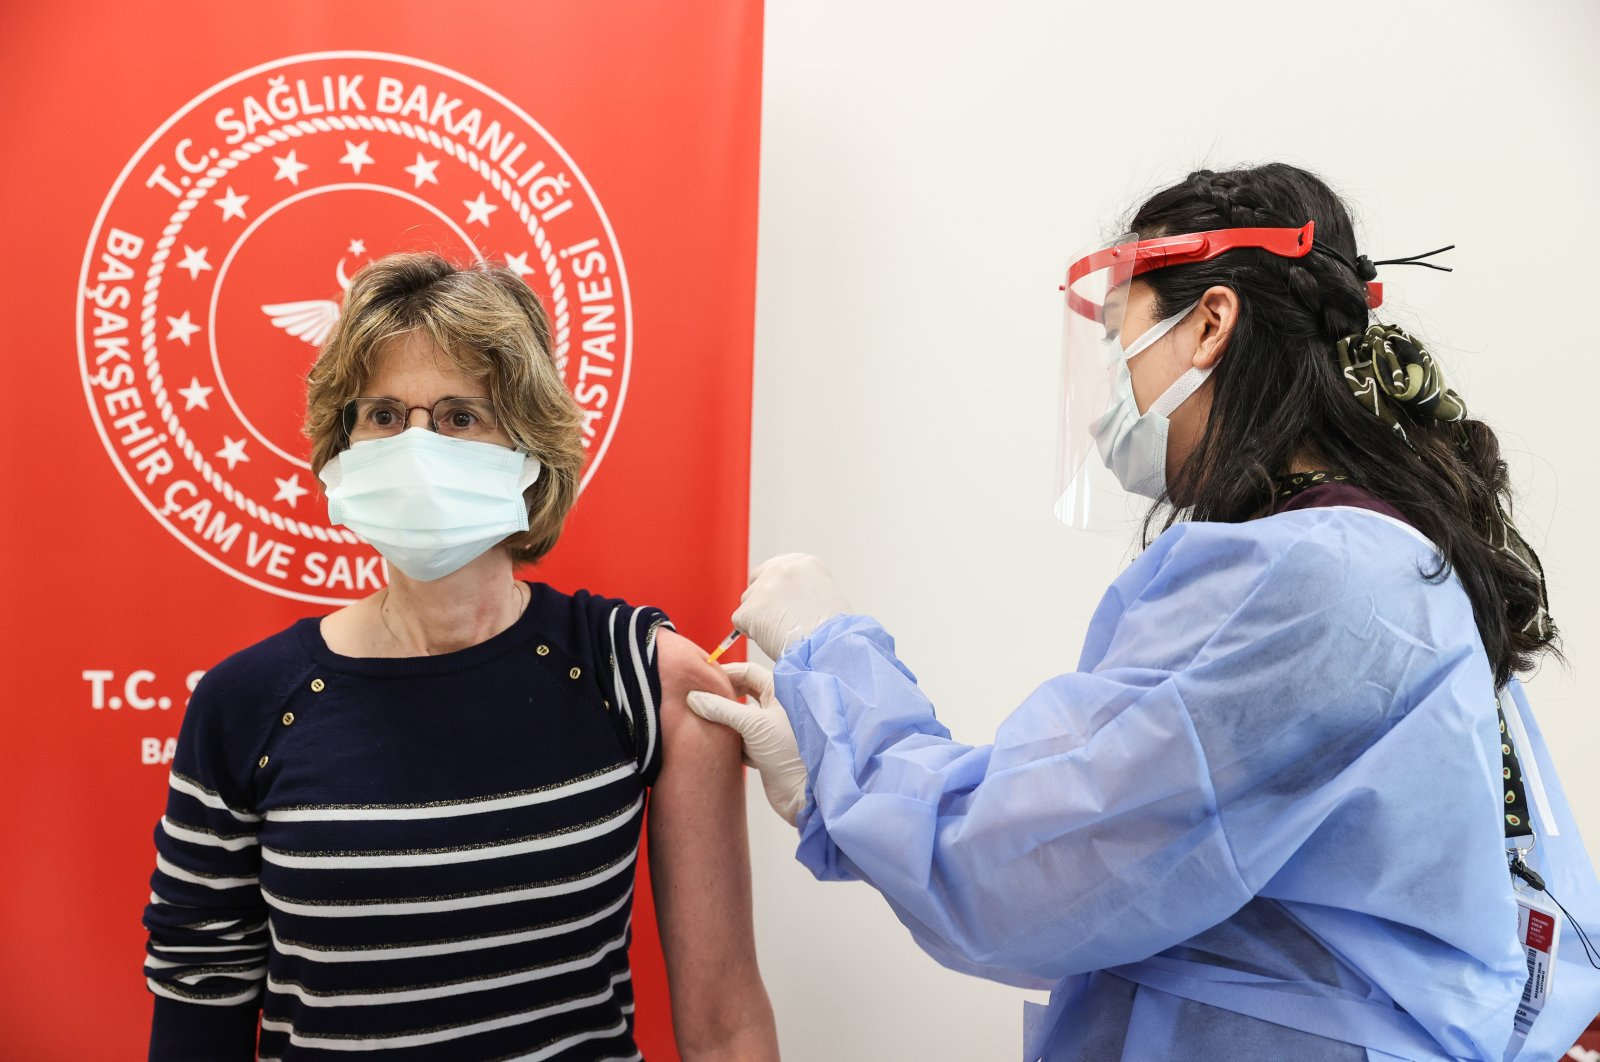 Turkey prefers more inspection over full lockdown against pandemic